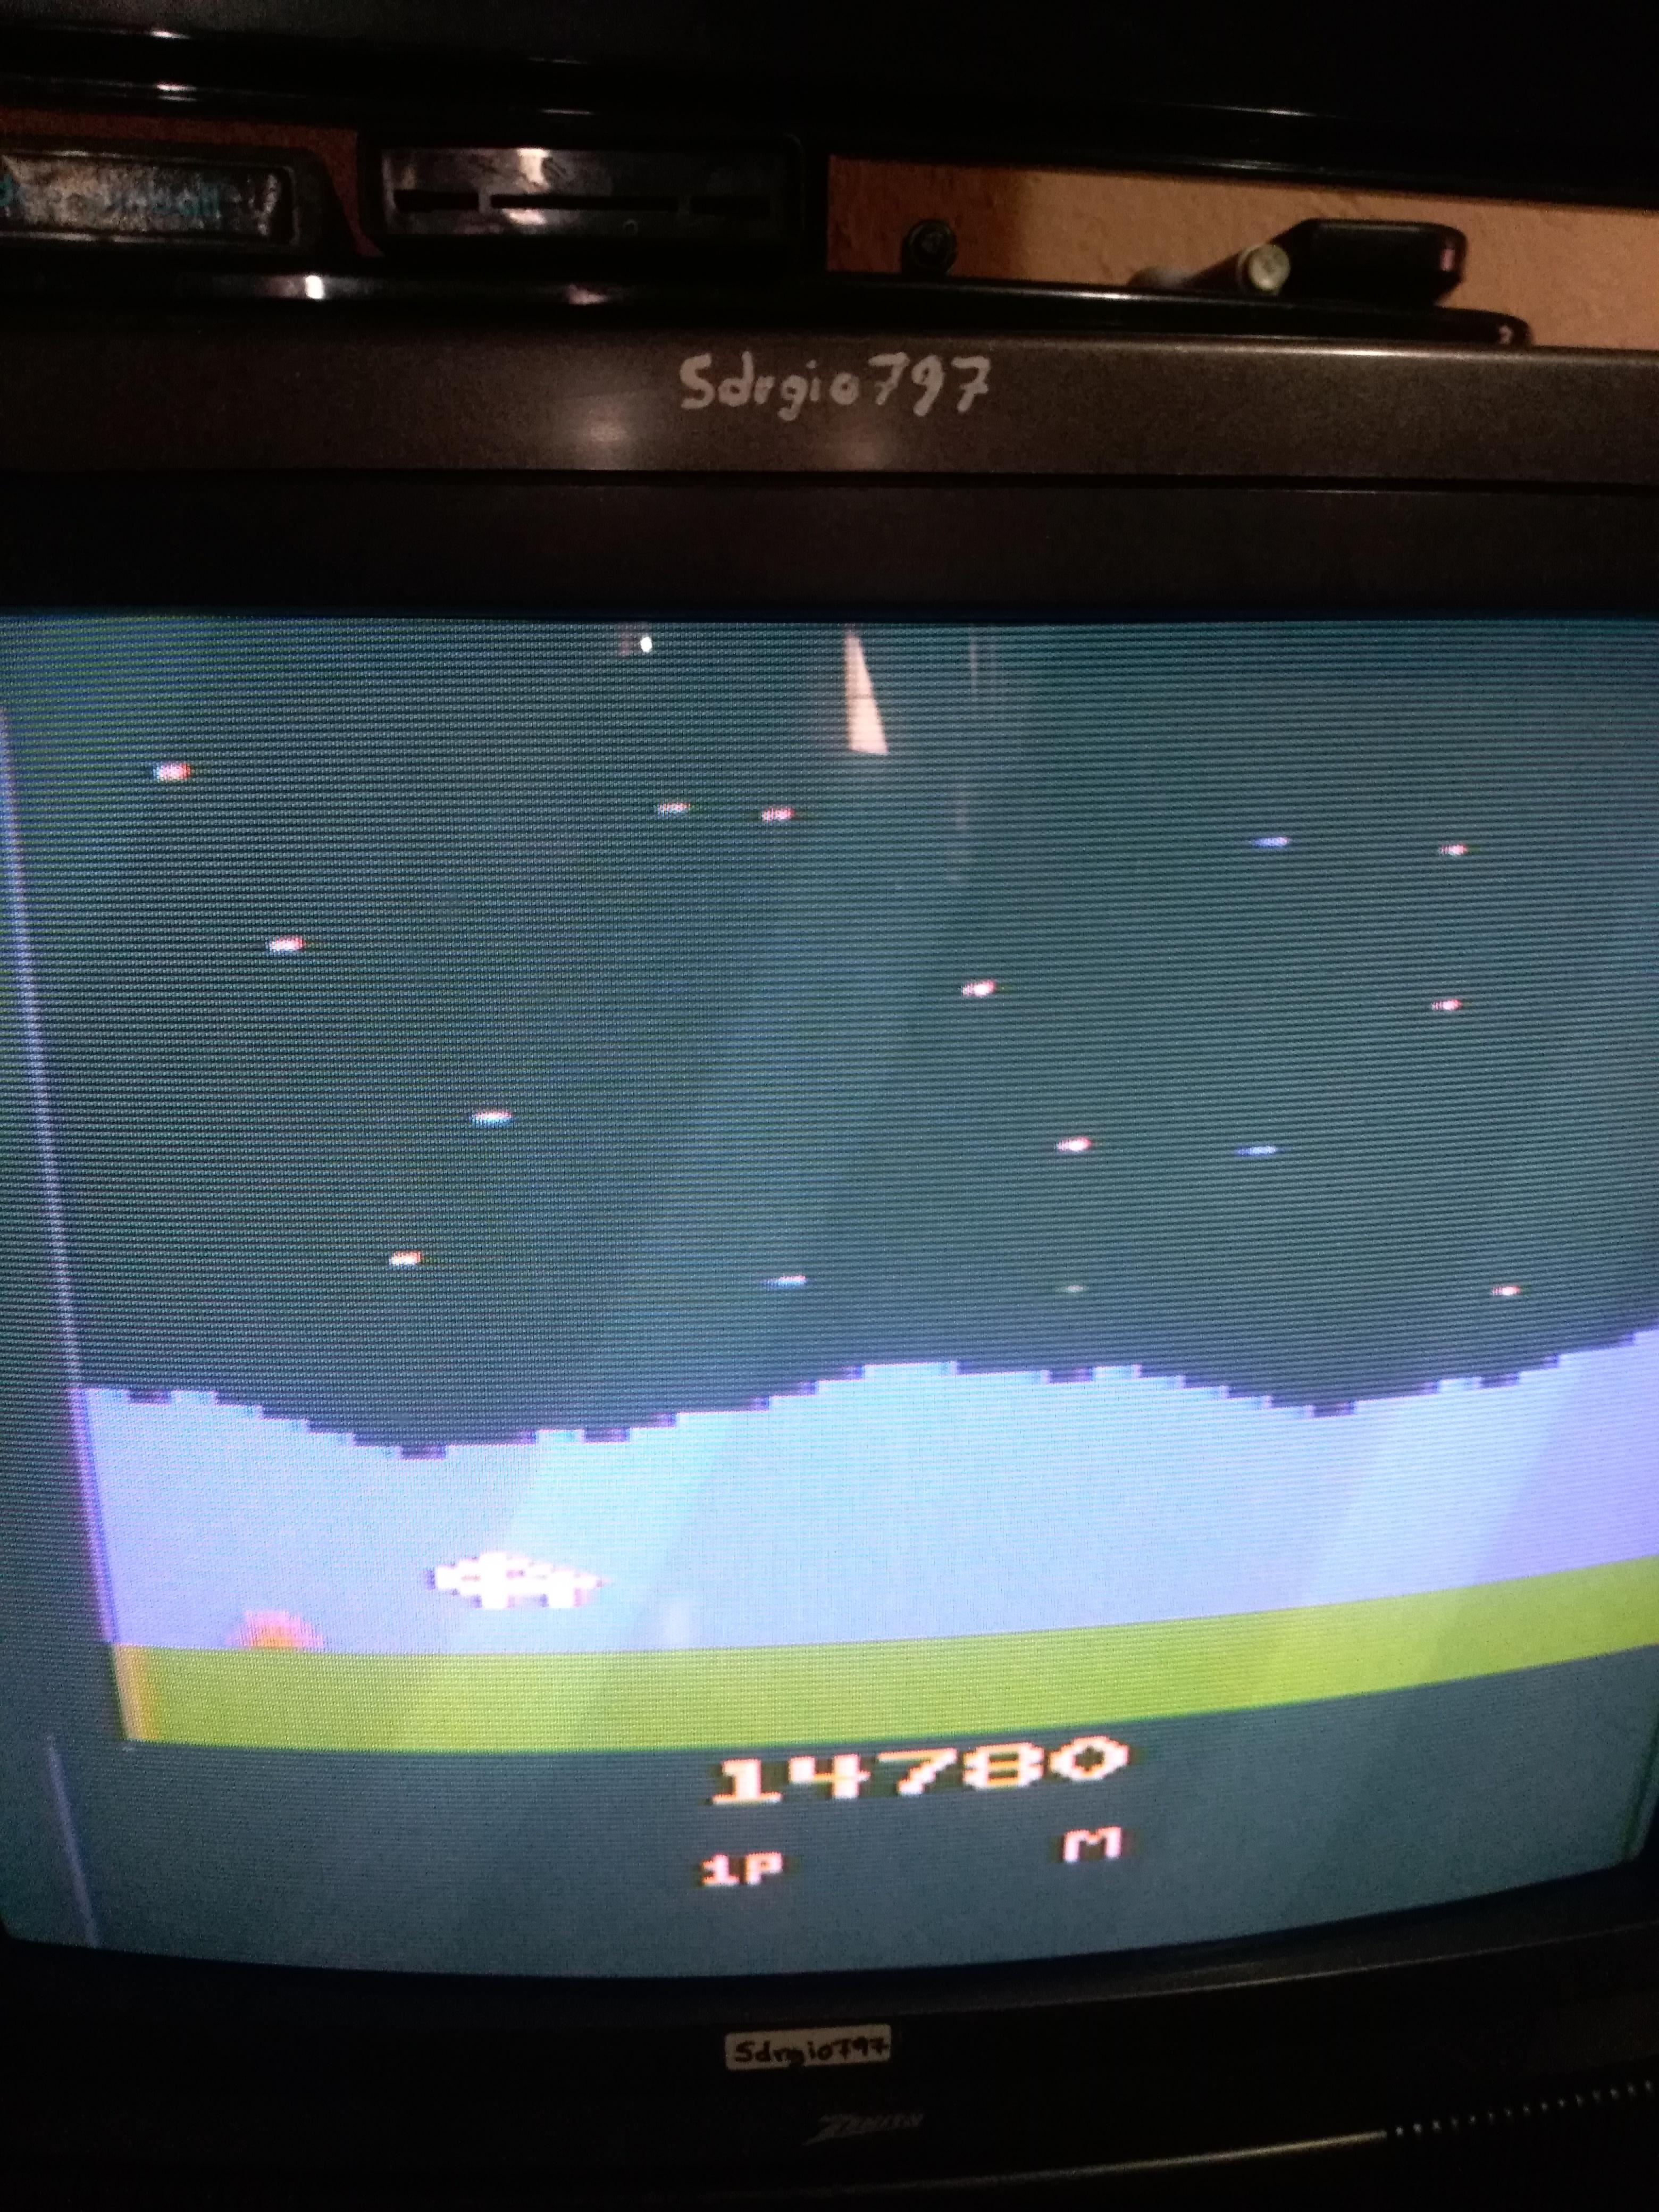 Sdrgio797: Moon Patrol (Atari 2600 Novice/B) 14,780 points on 2020-06-30 13:56:14